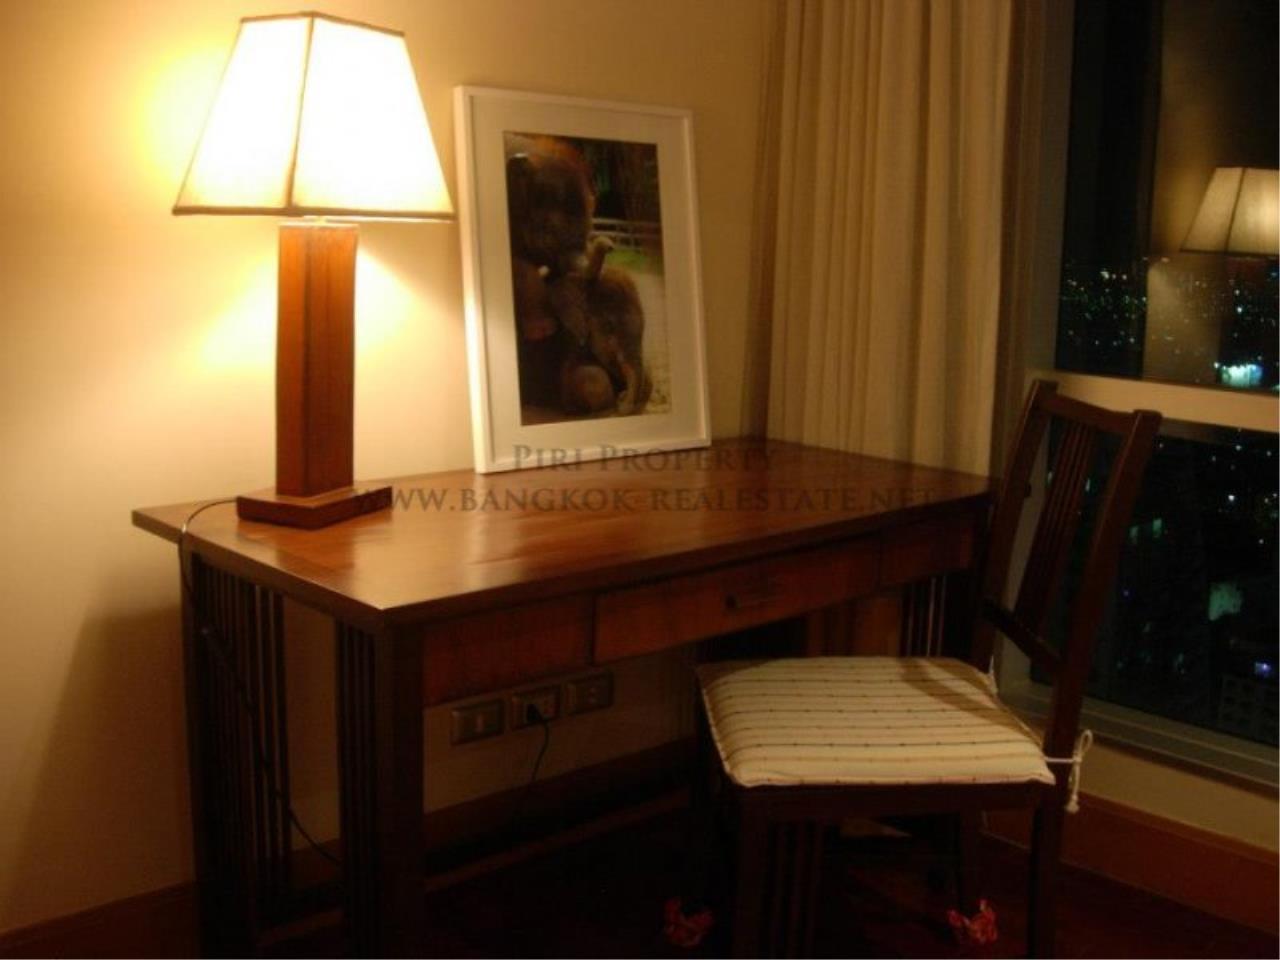 Piri Property Agency's Ascott Sathorn - Spacious 2 Bedroom Condo Unit for Rent - Sky Villa Sathorn 5